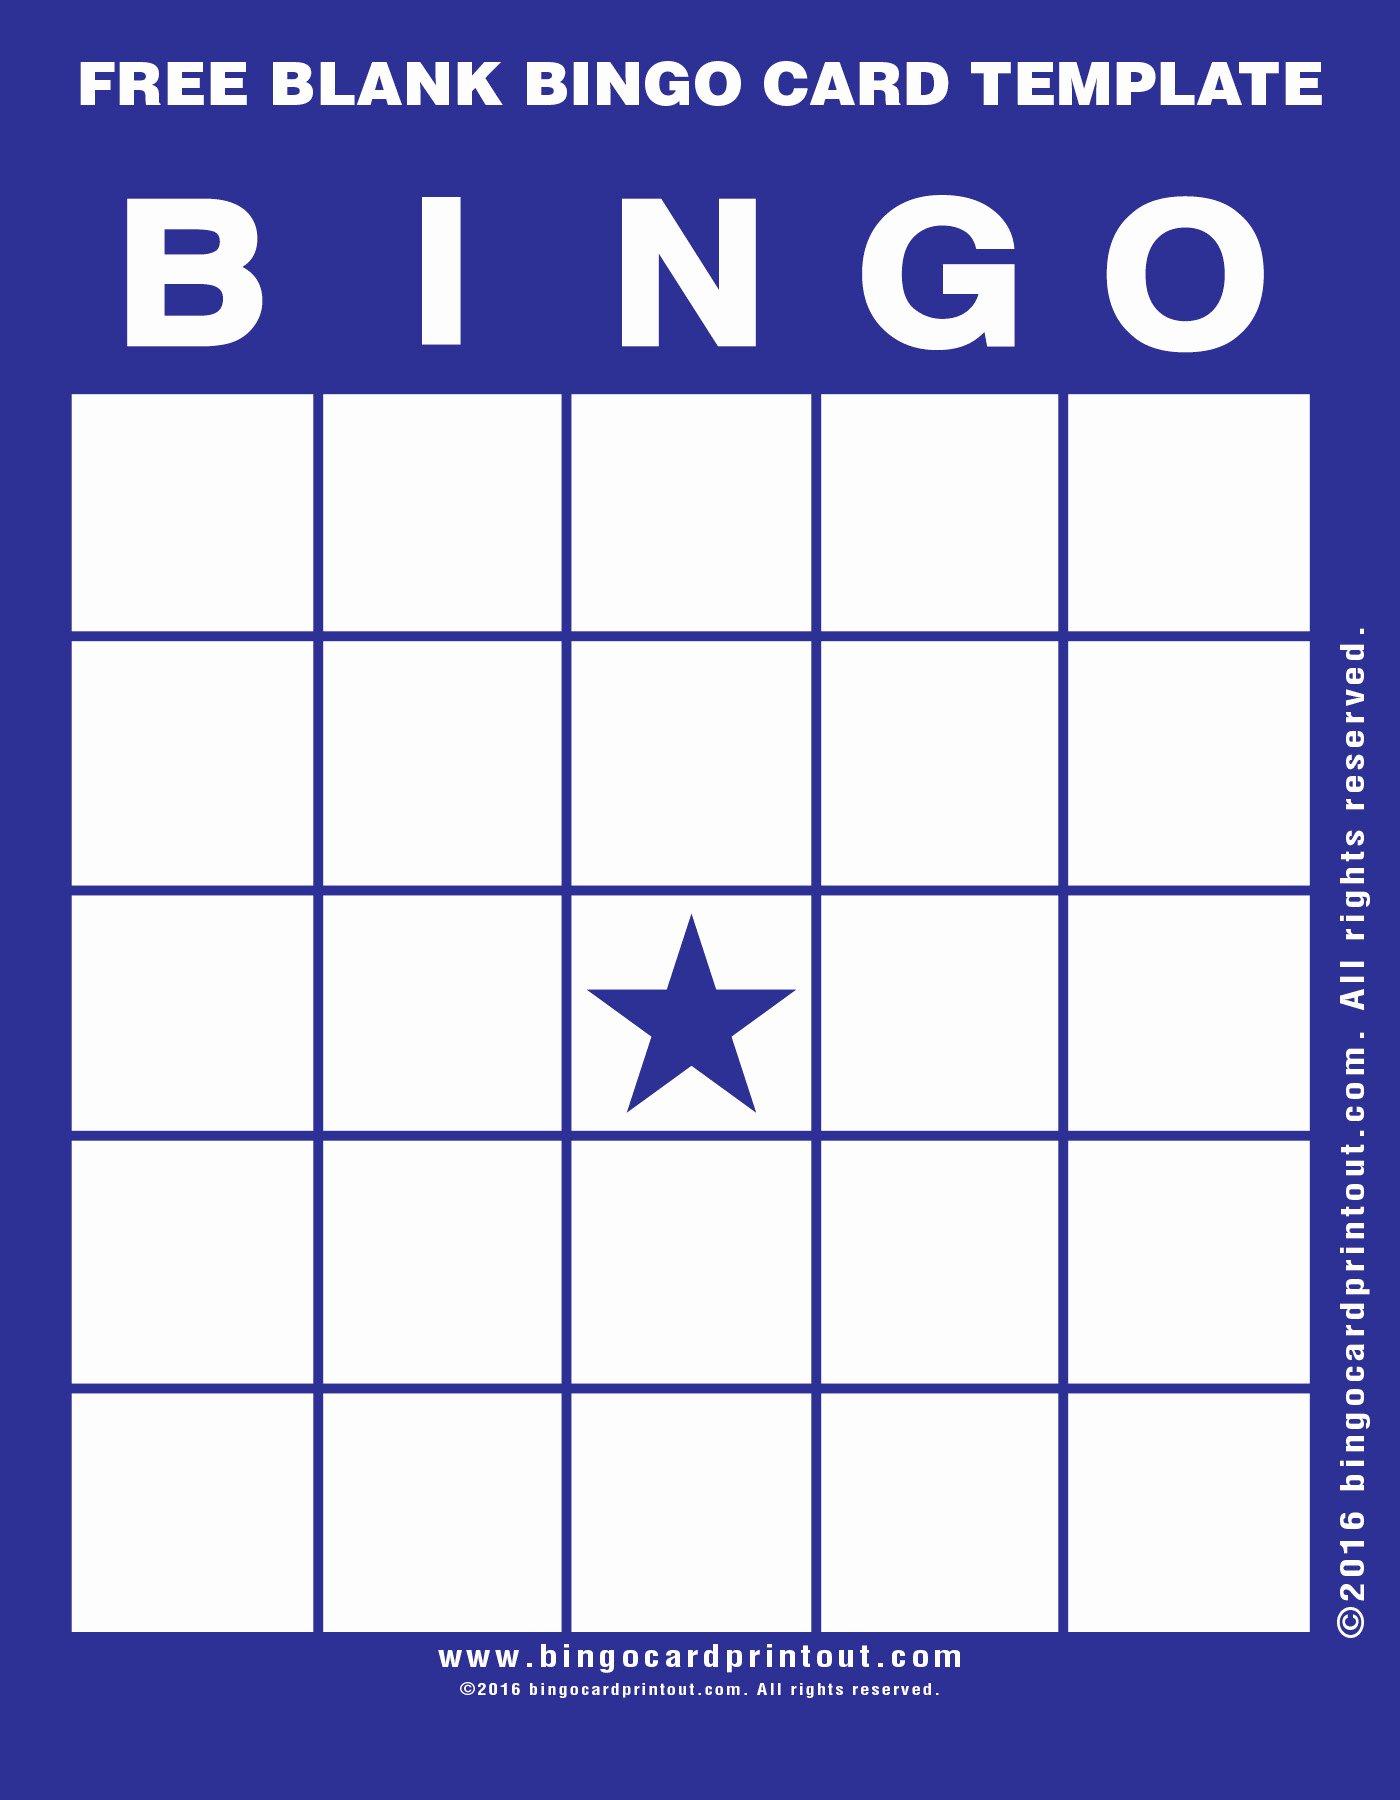 Free Blank Bingo Card Template Bingocardprintout